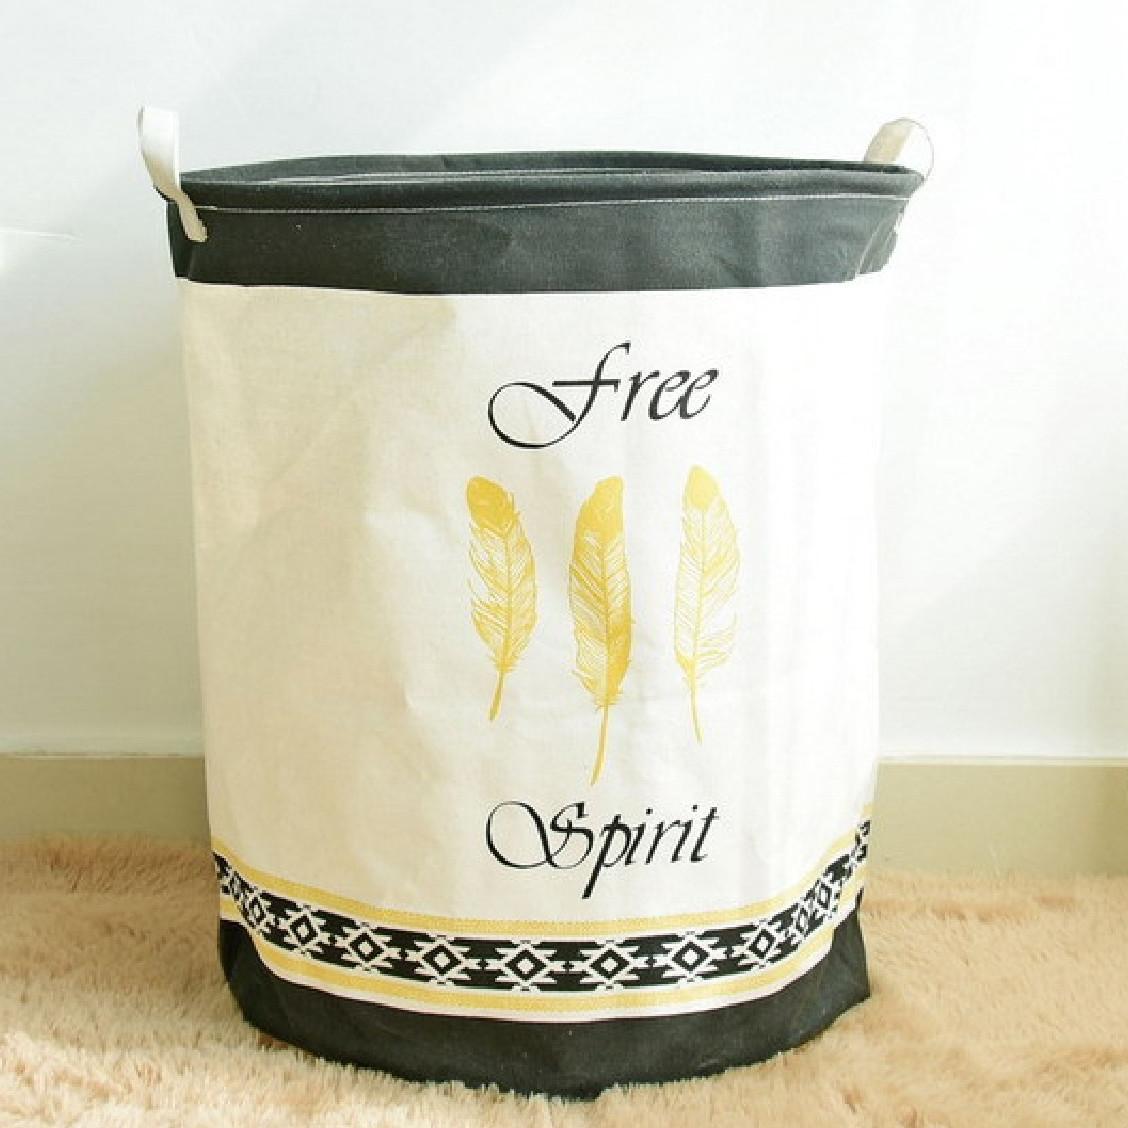 Корзина для игрушек Free Spirit Berni (2220)